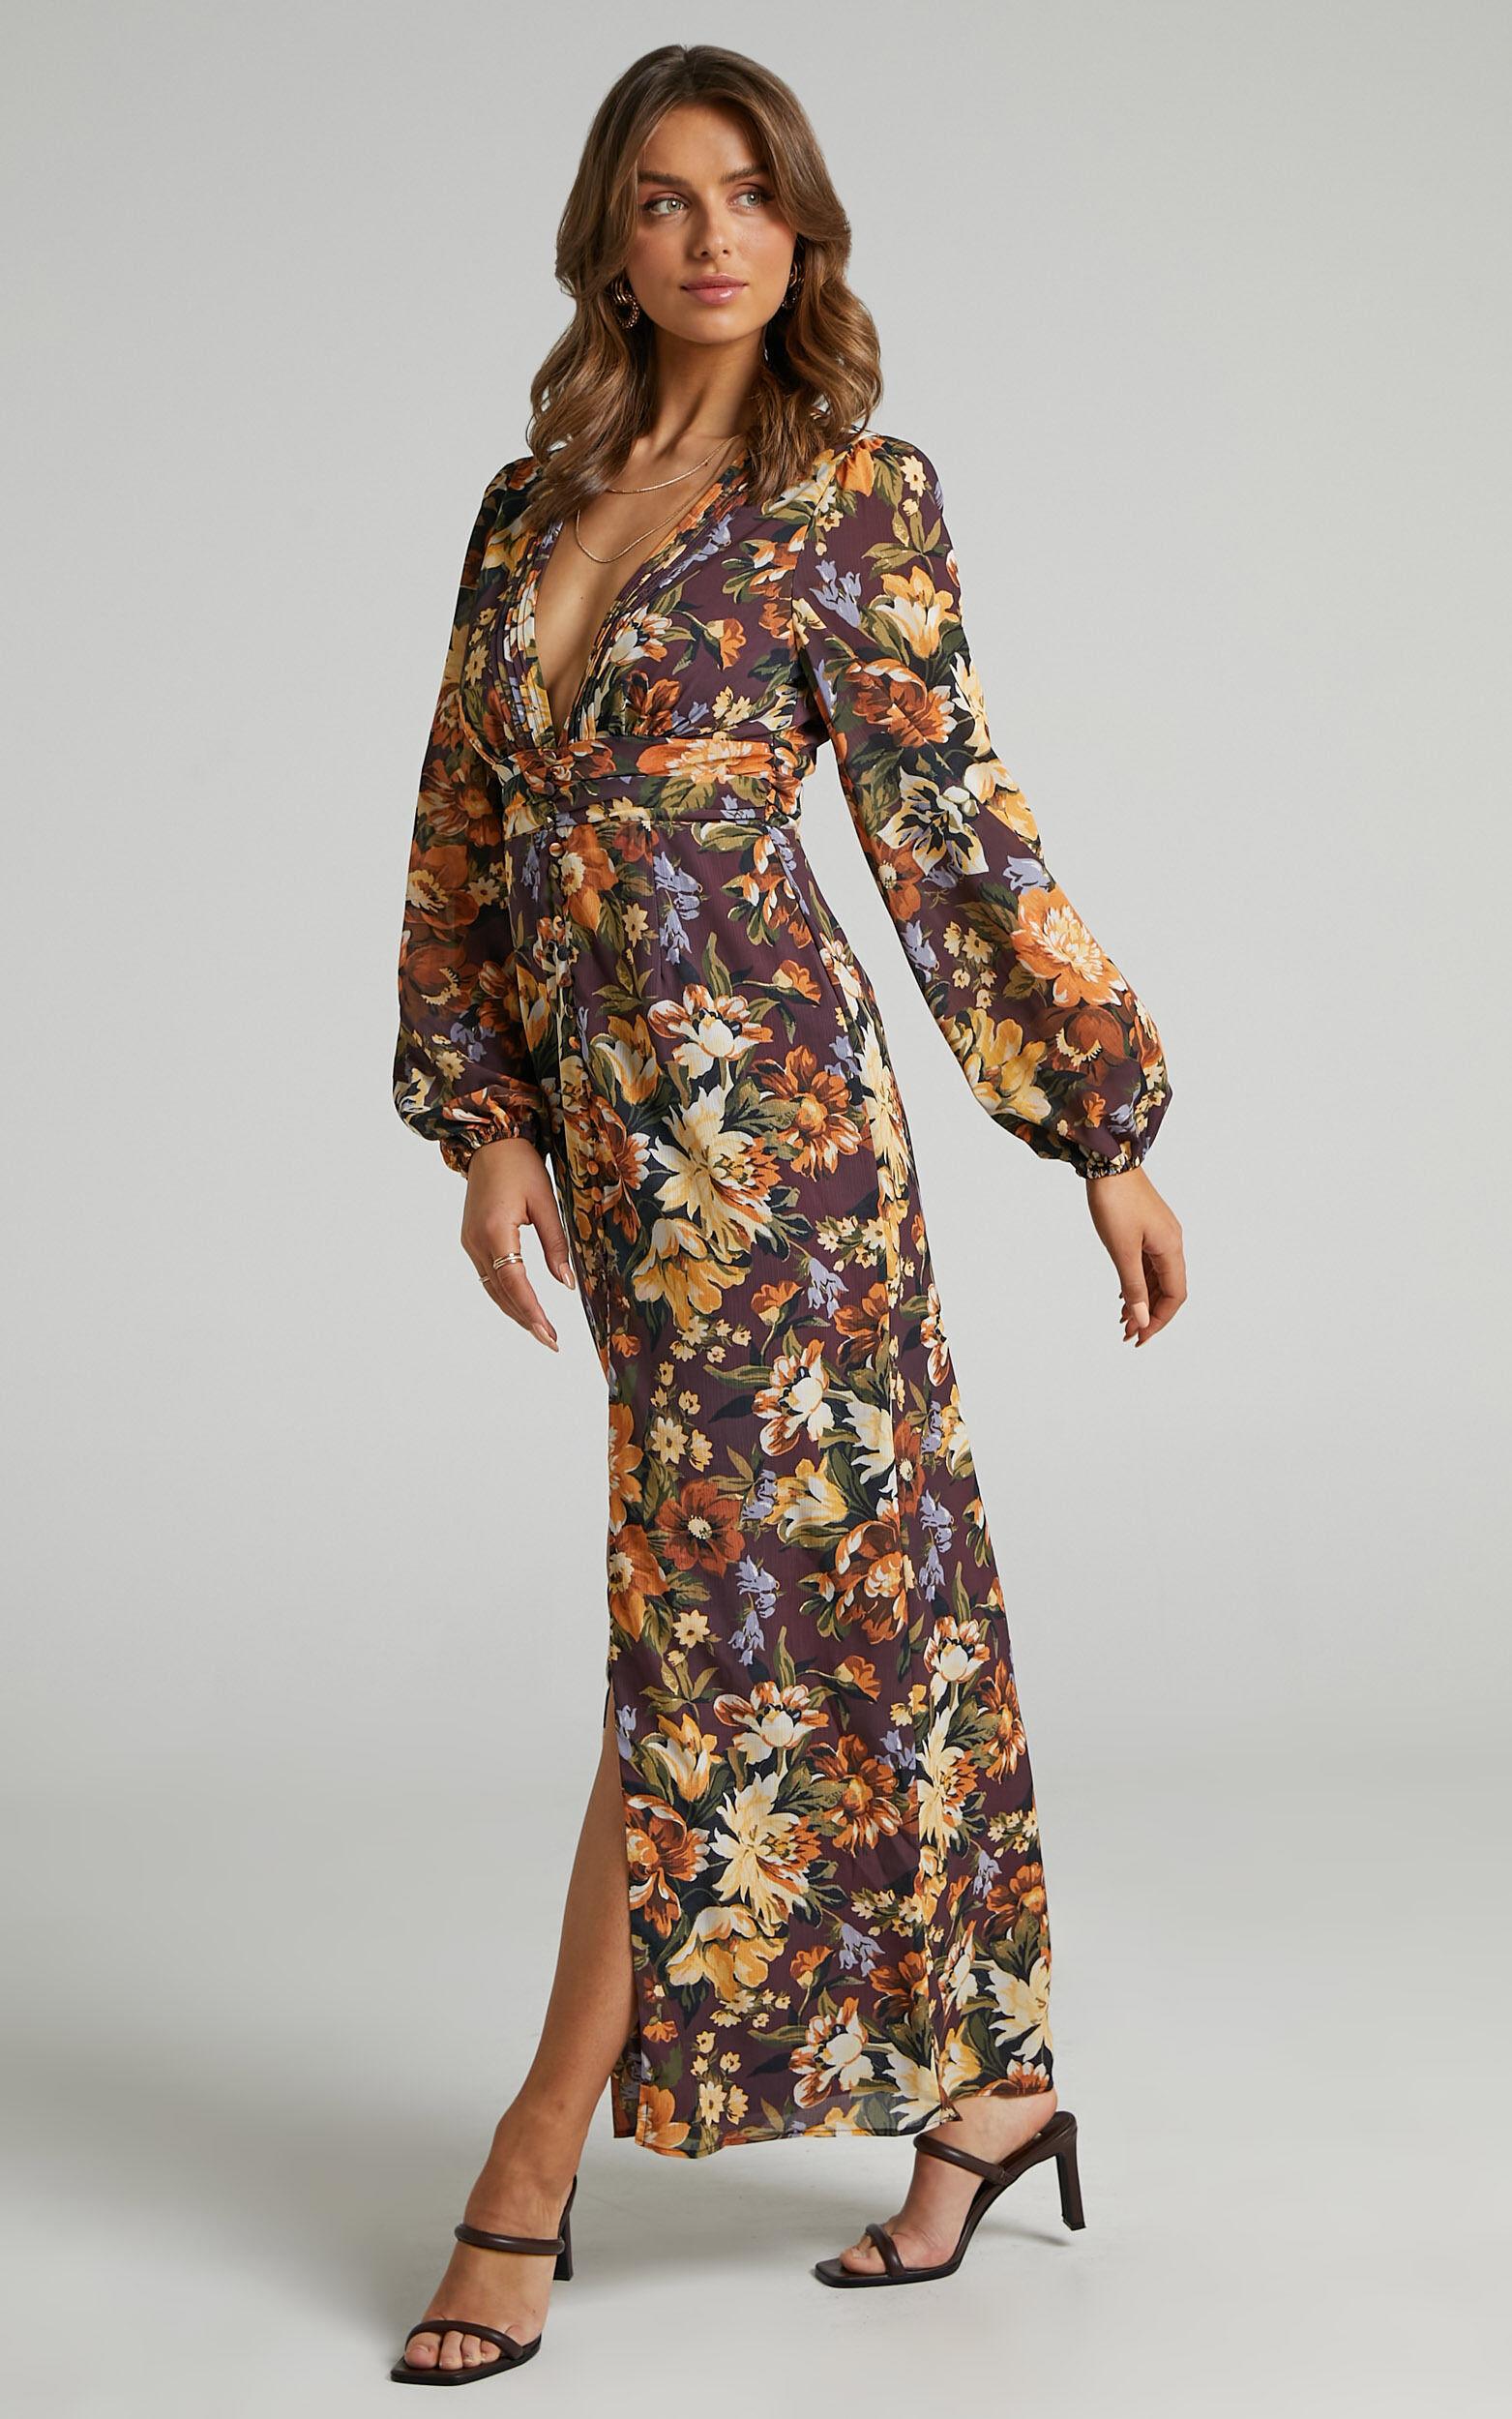 Lorelei V Neck Balloon Sleeve Maxi Dress in Indulgent Bloom - 06, BRN1, super-hi-res image number null